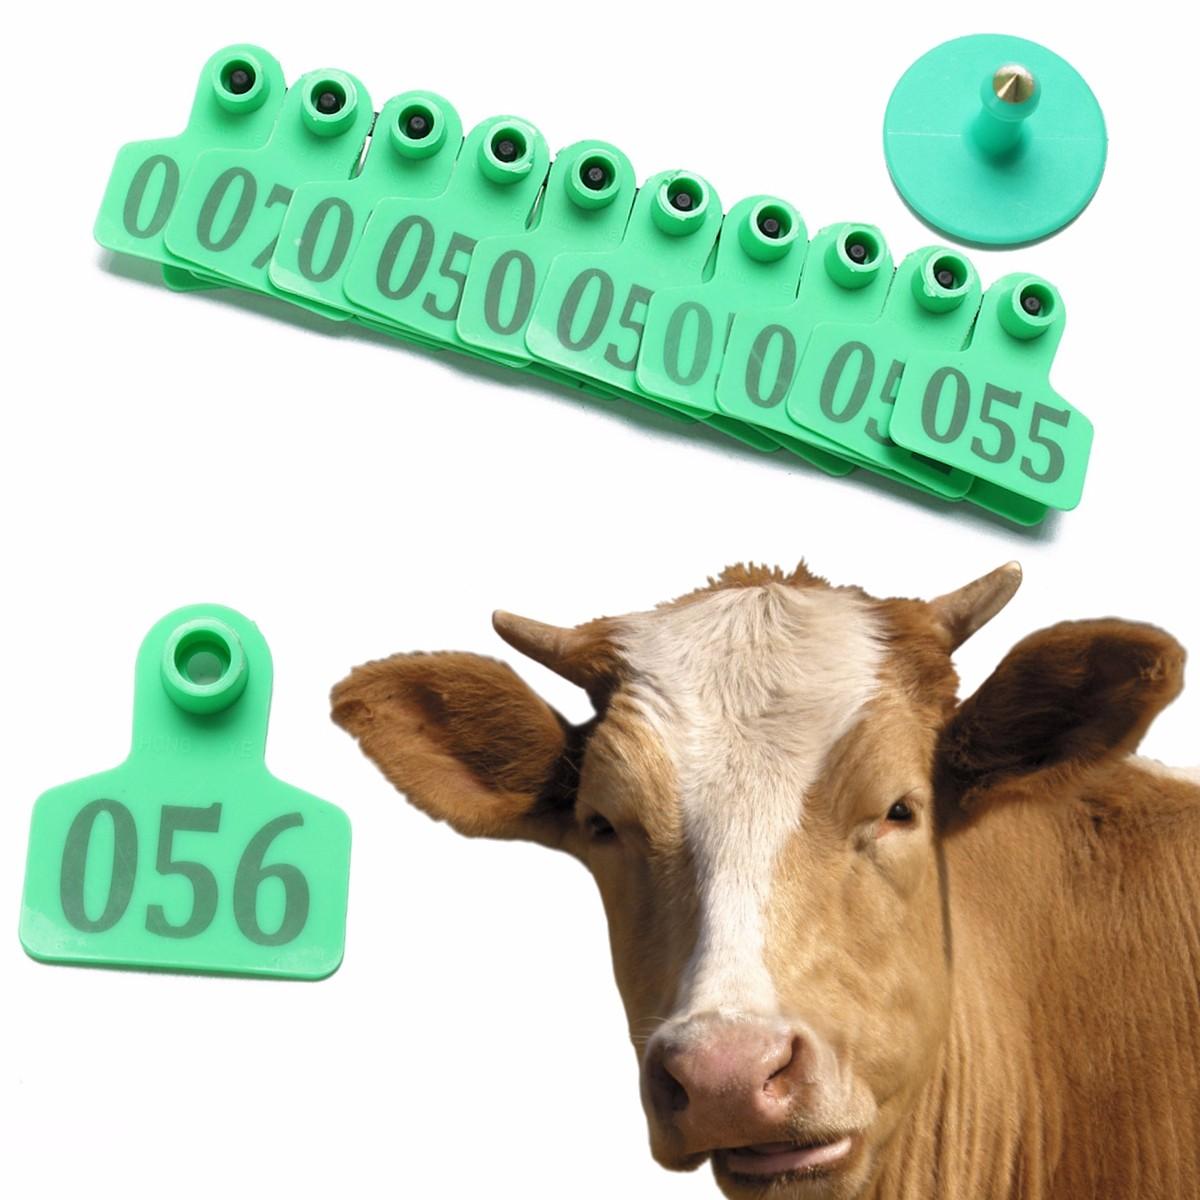 100 pcs Ear Tag Sheep Goat Pig Cattle Cow Farm Animals Livestock Green